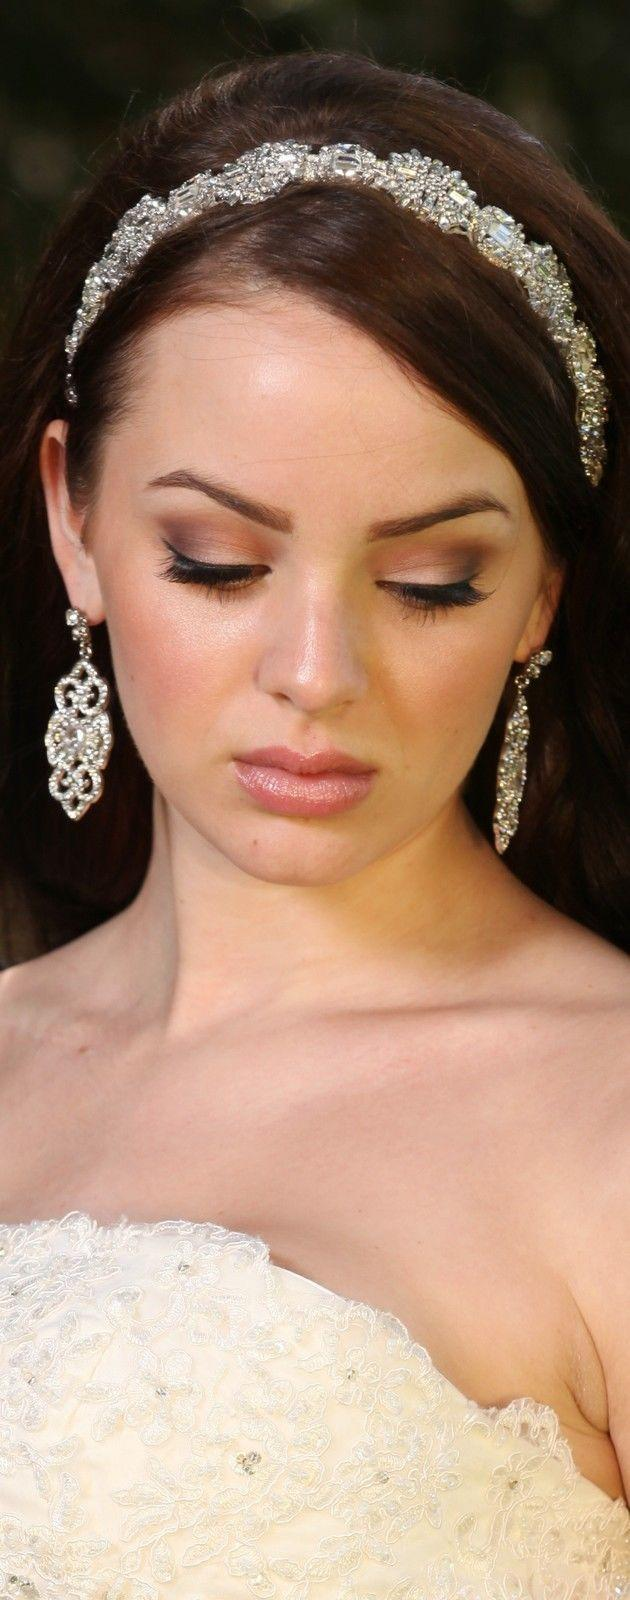 Wedding - Bridal Party Art Deco Bridesmaid Rhinestone Crystal Earrings